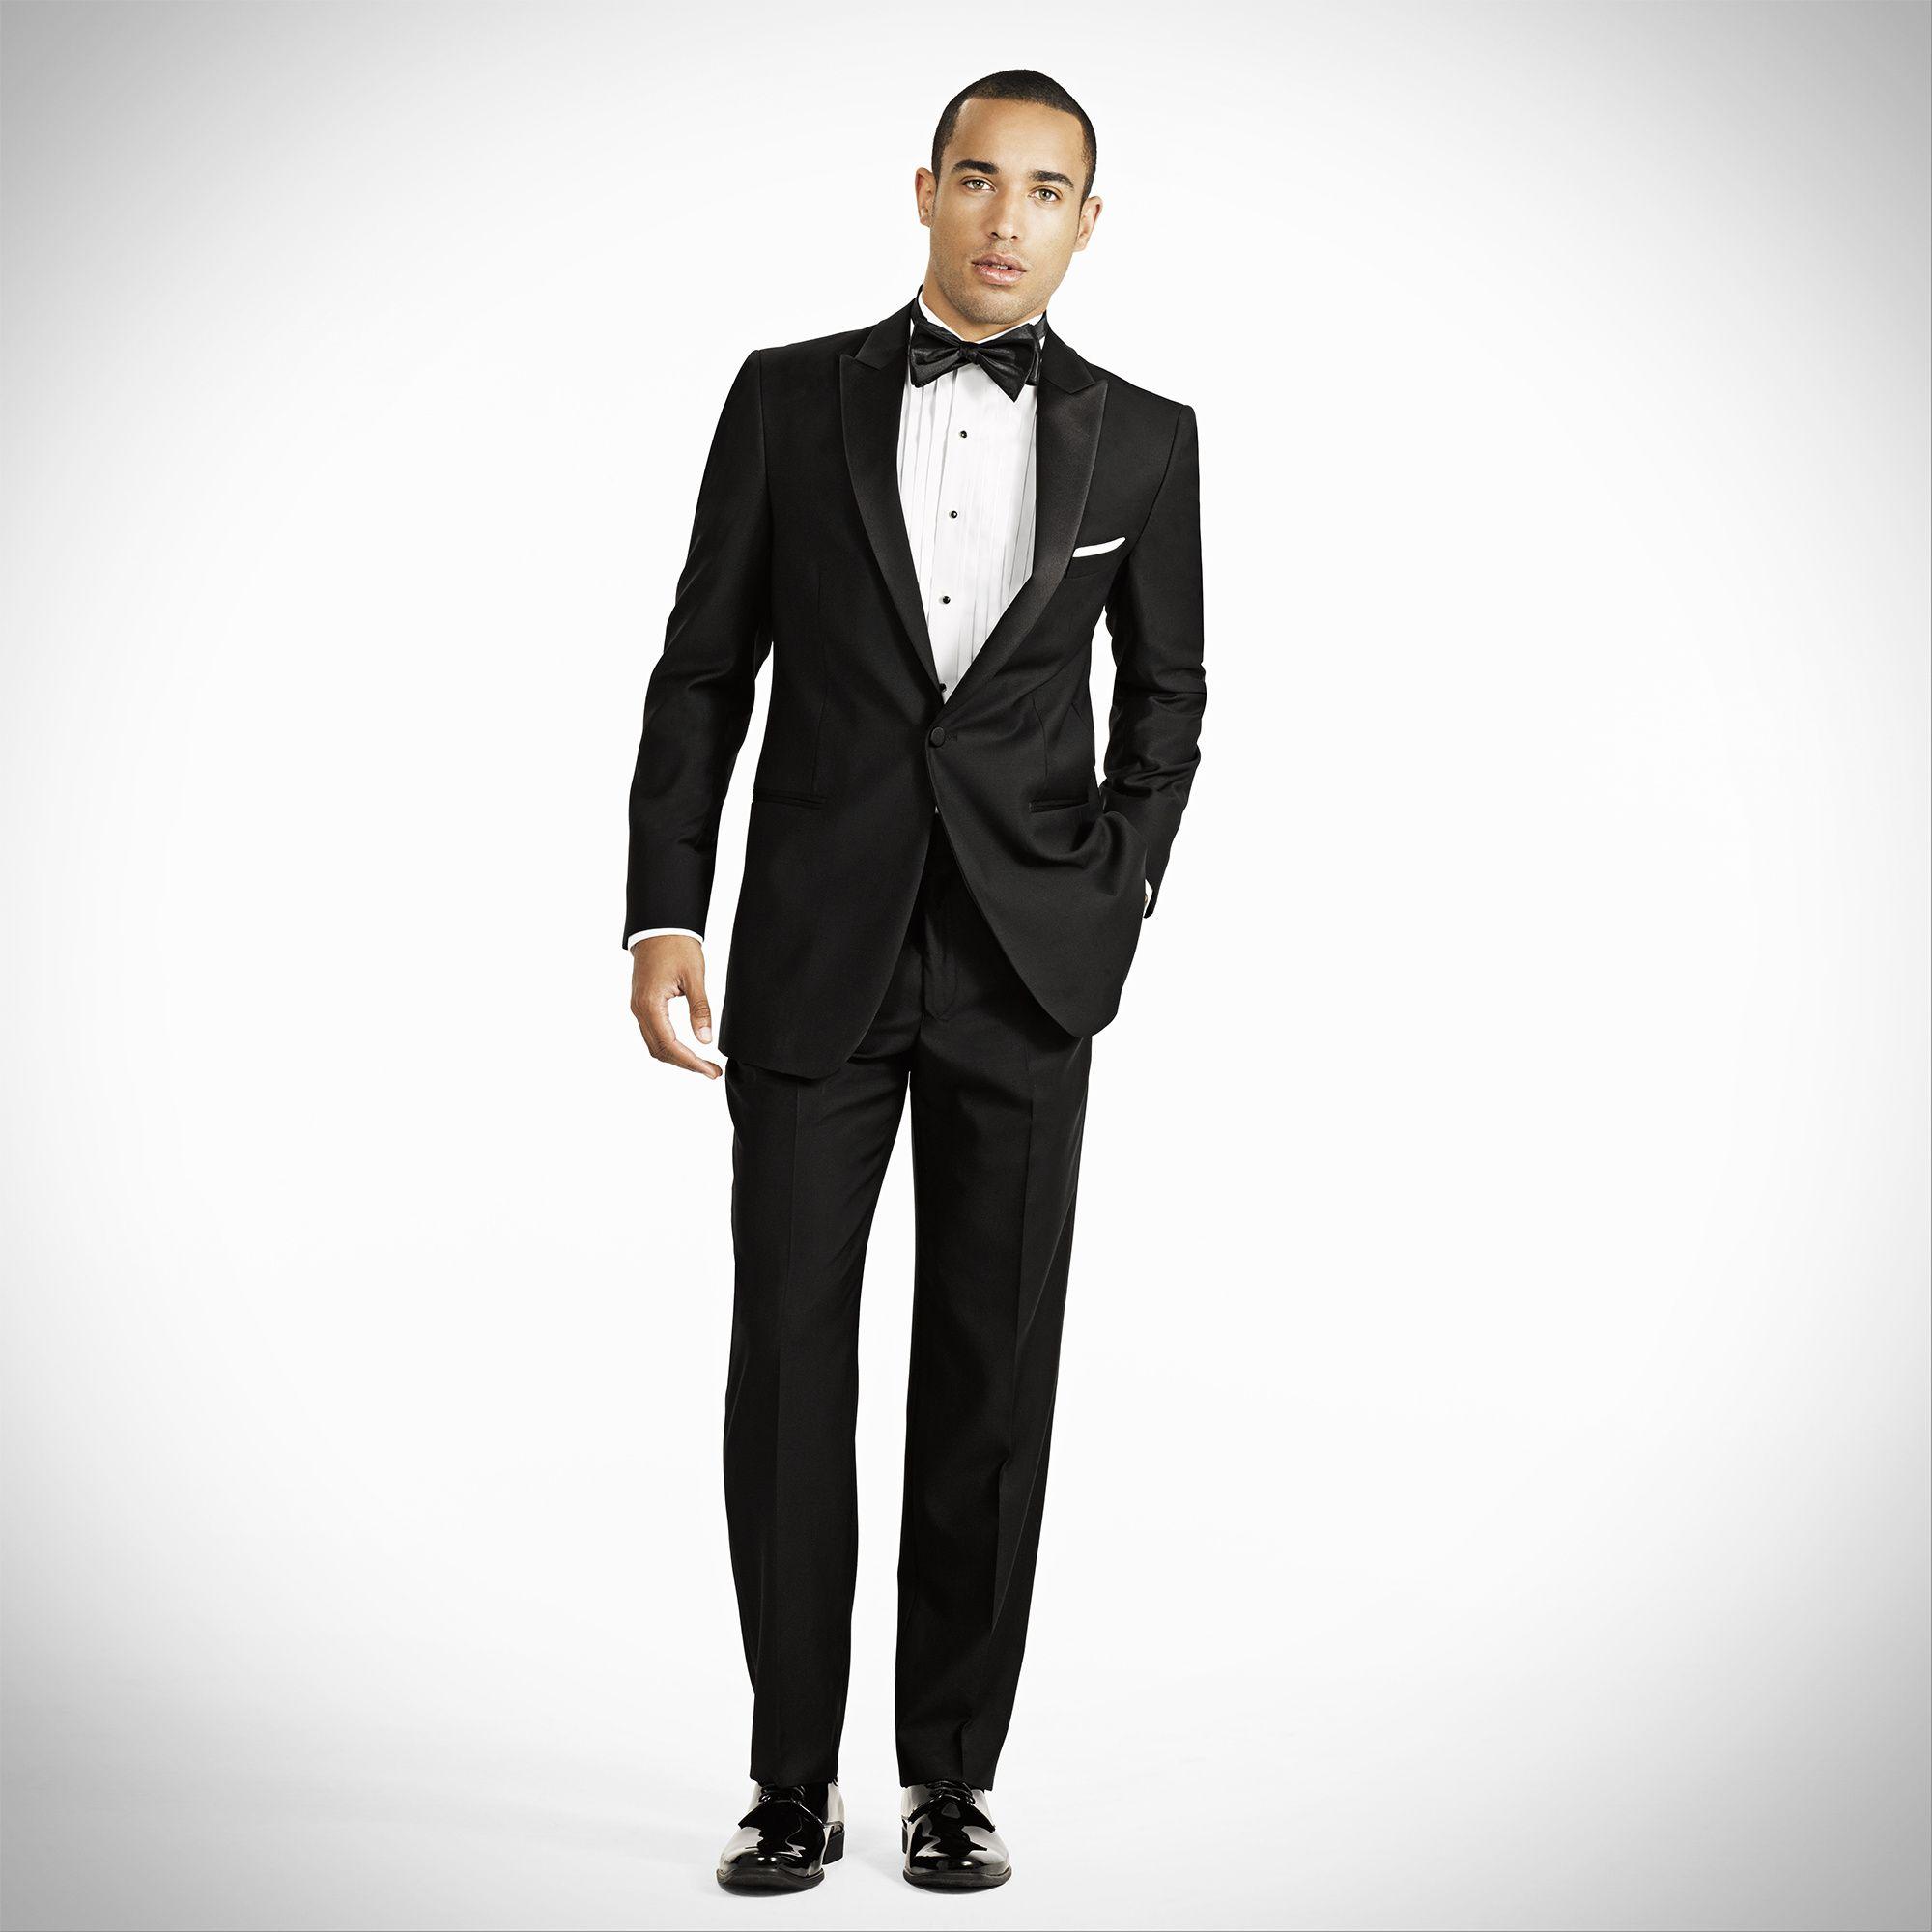 Black Peak Lapel Tux Generation tux, Wedding suit rental